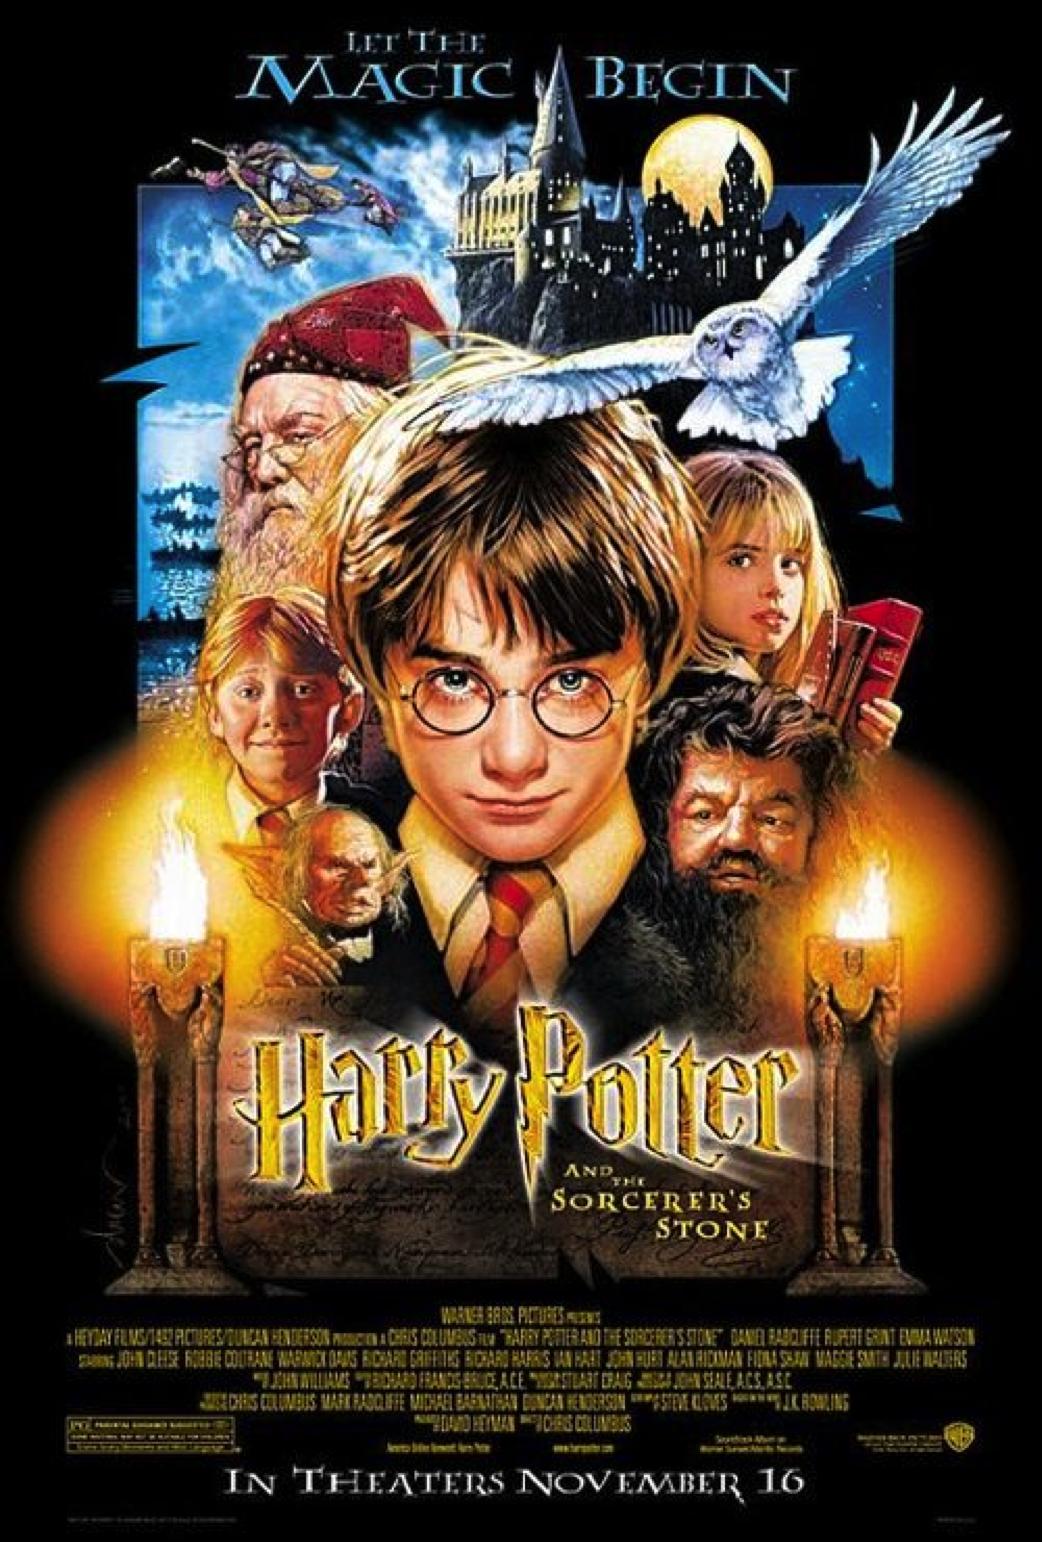 Pin Von Horst Loose Auf Superhero Cover Arts Harry Potter Film Filme Sehen Filme